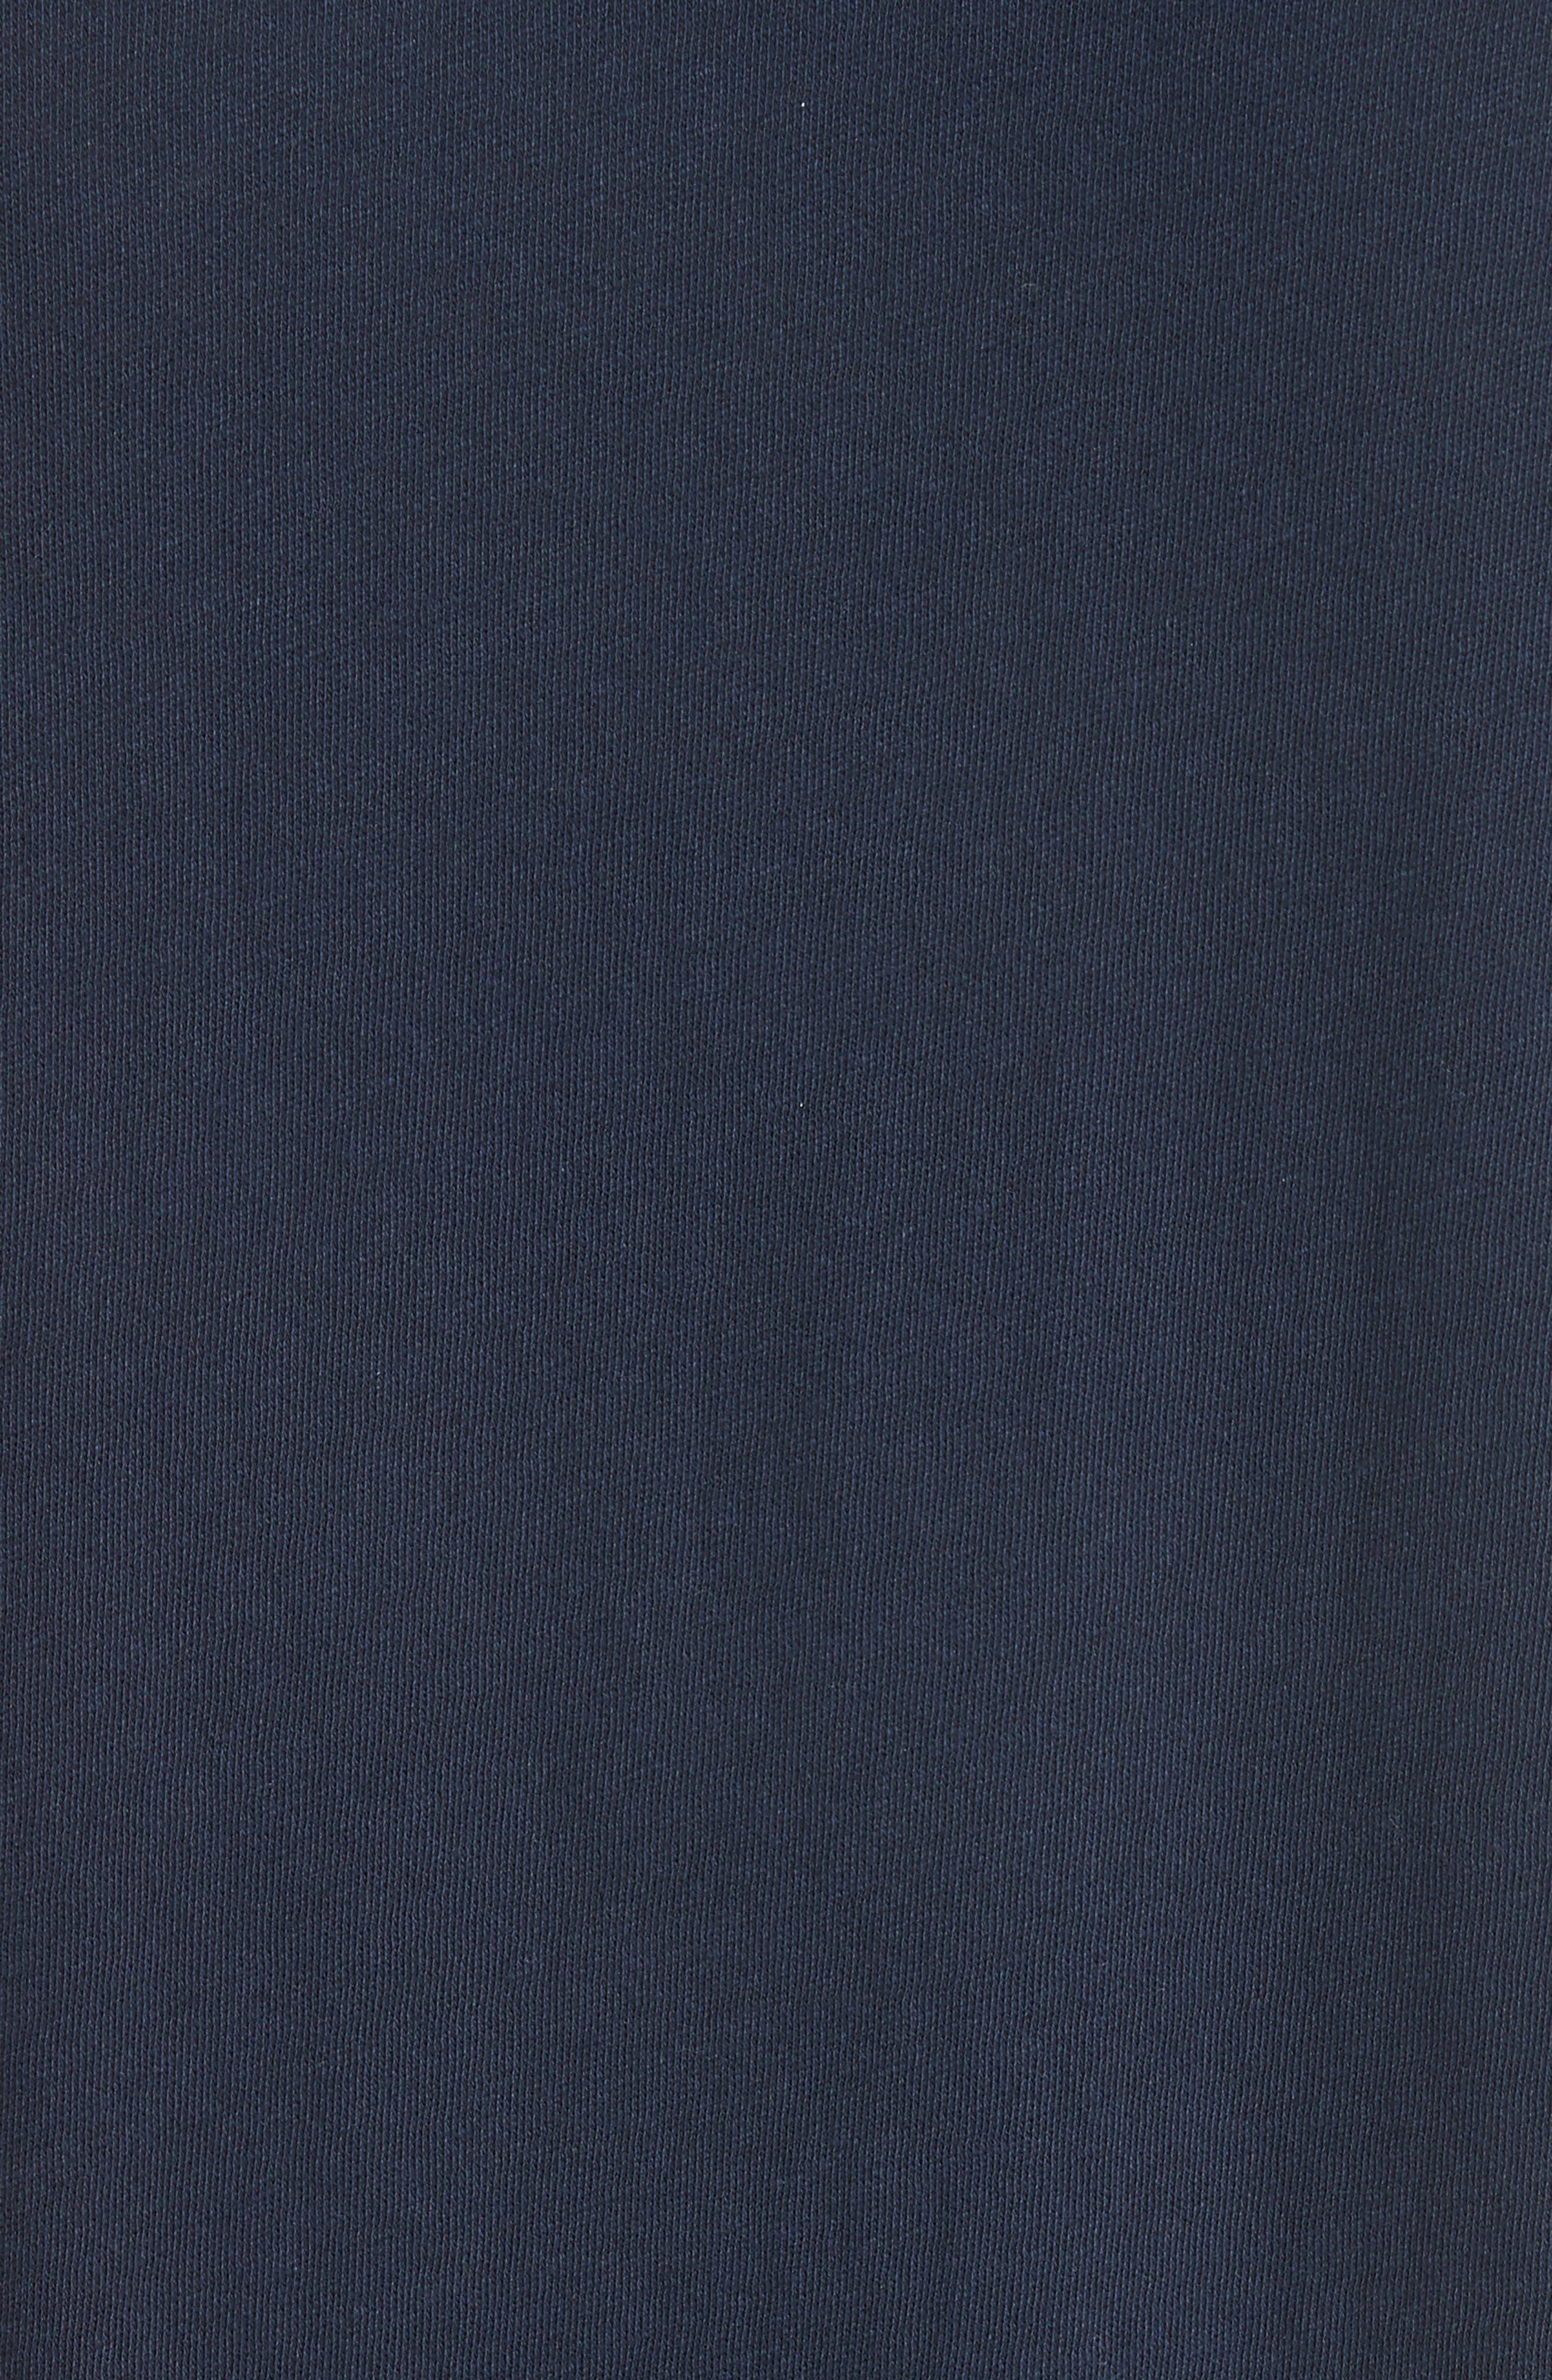 Hartley Crewneck Cotton & Linen T-Shirt,                             Alternate thumbnail 5, color,                             Navy